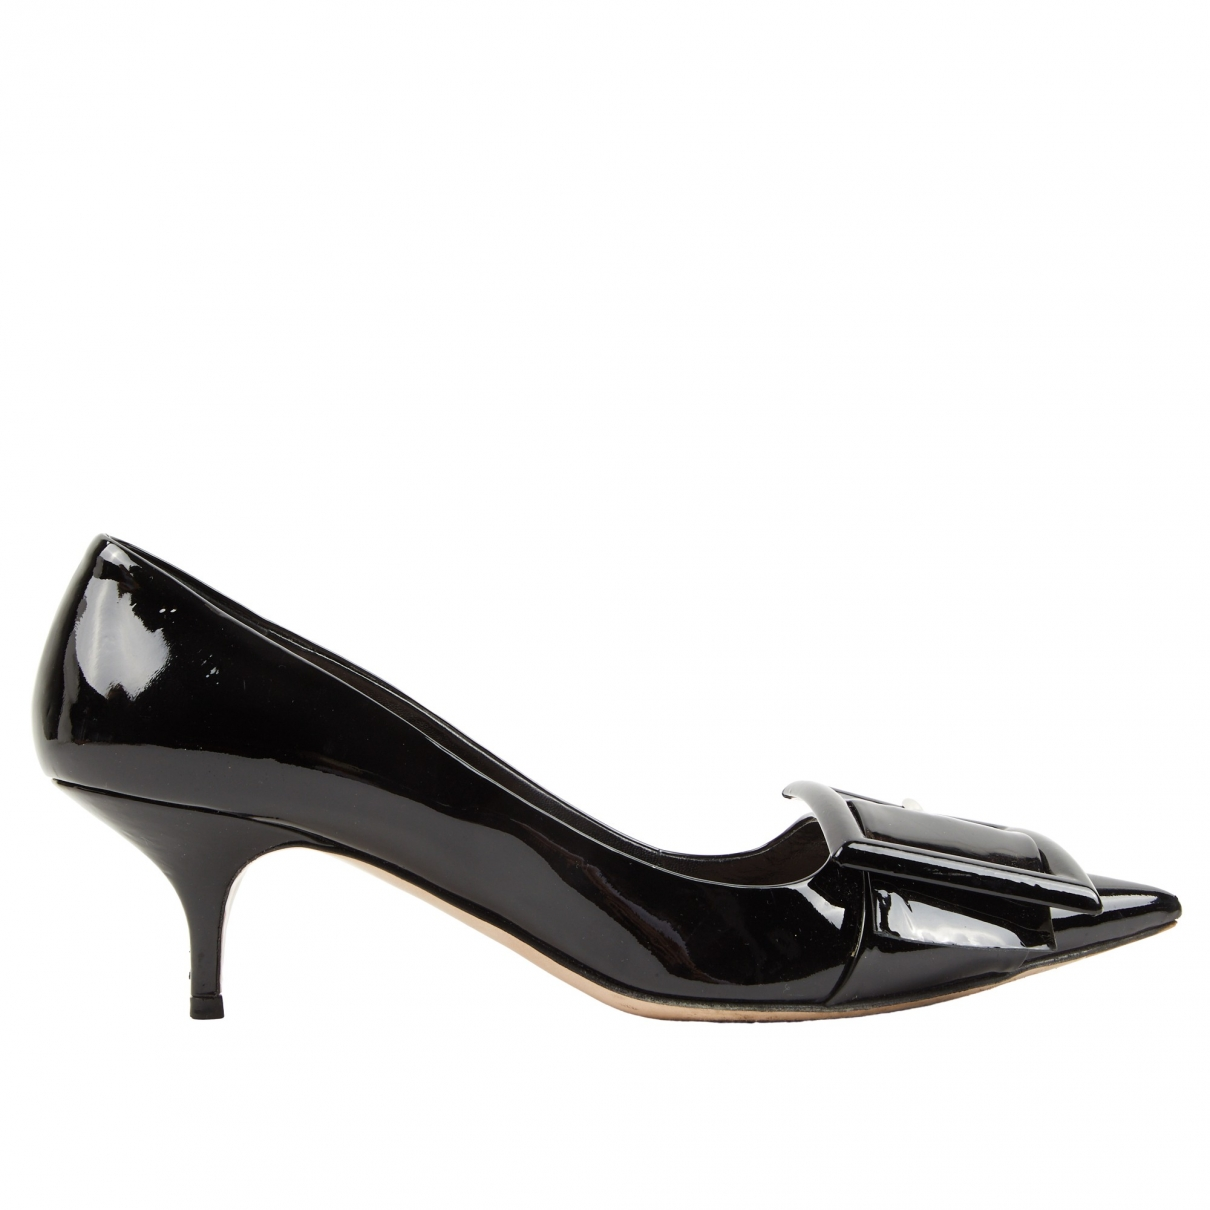 Miu Miu \N Black Patent leather Heels for Women 39.5 EU